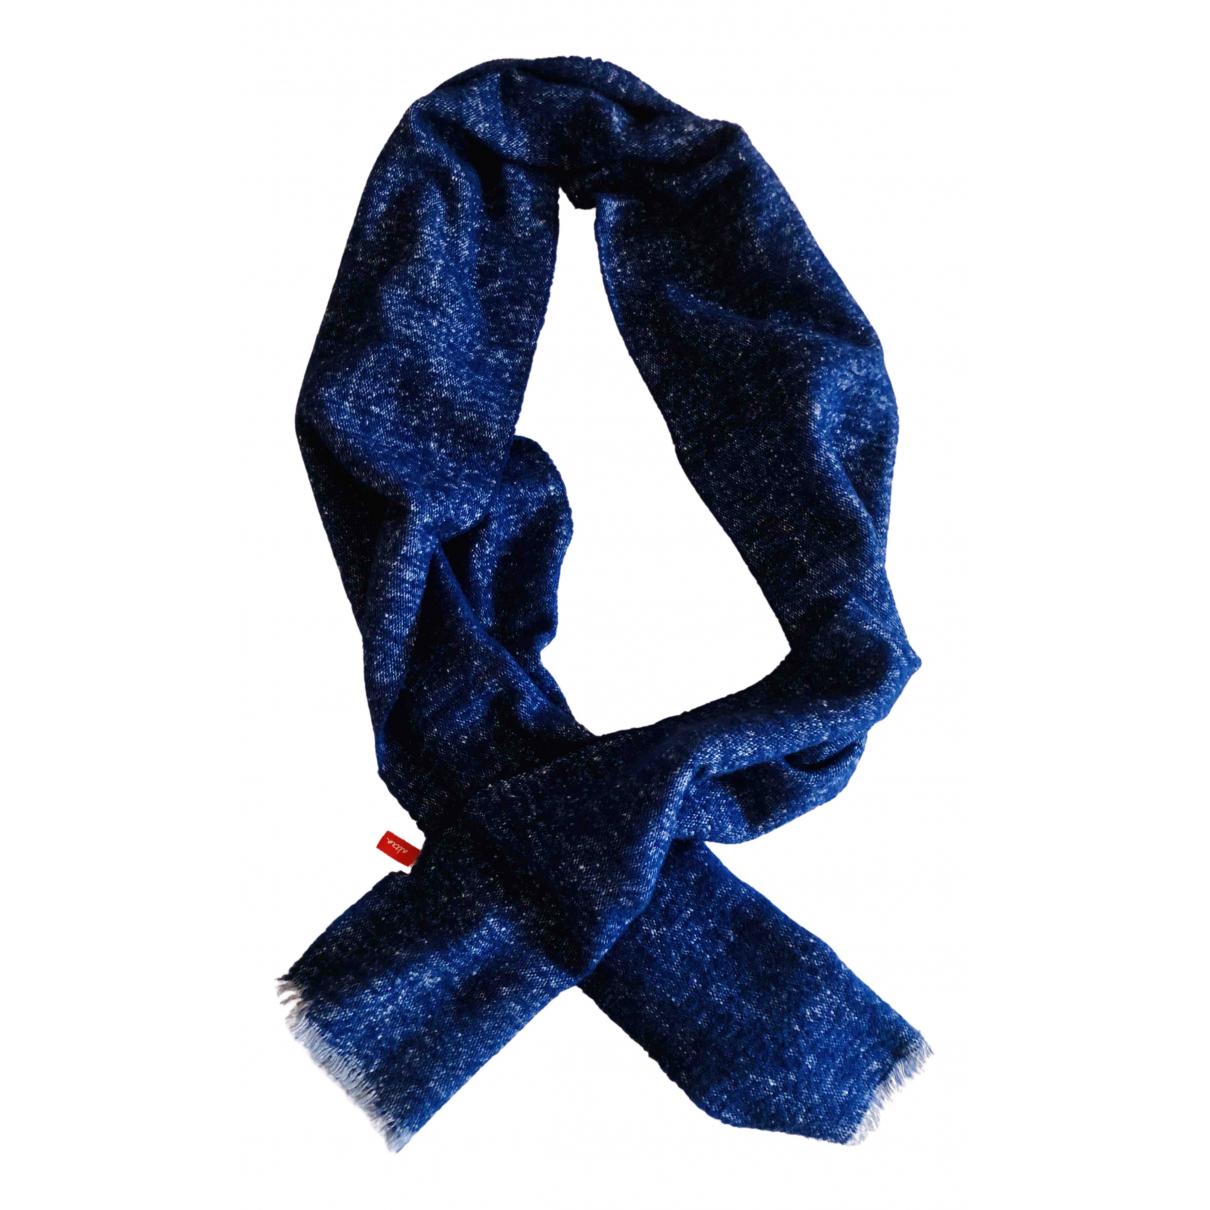 Altea \N Tuecher, Schal in  Blau Wolle